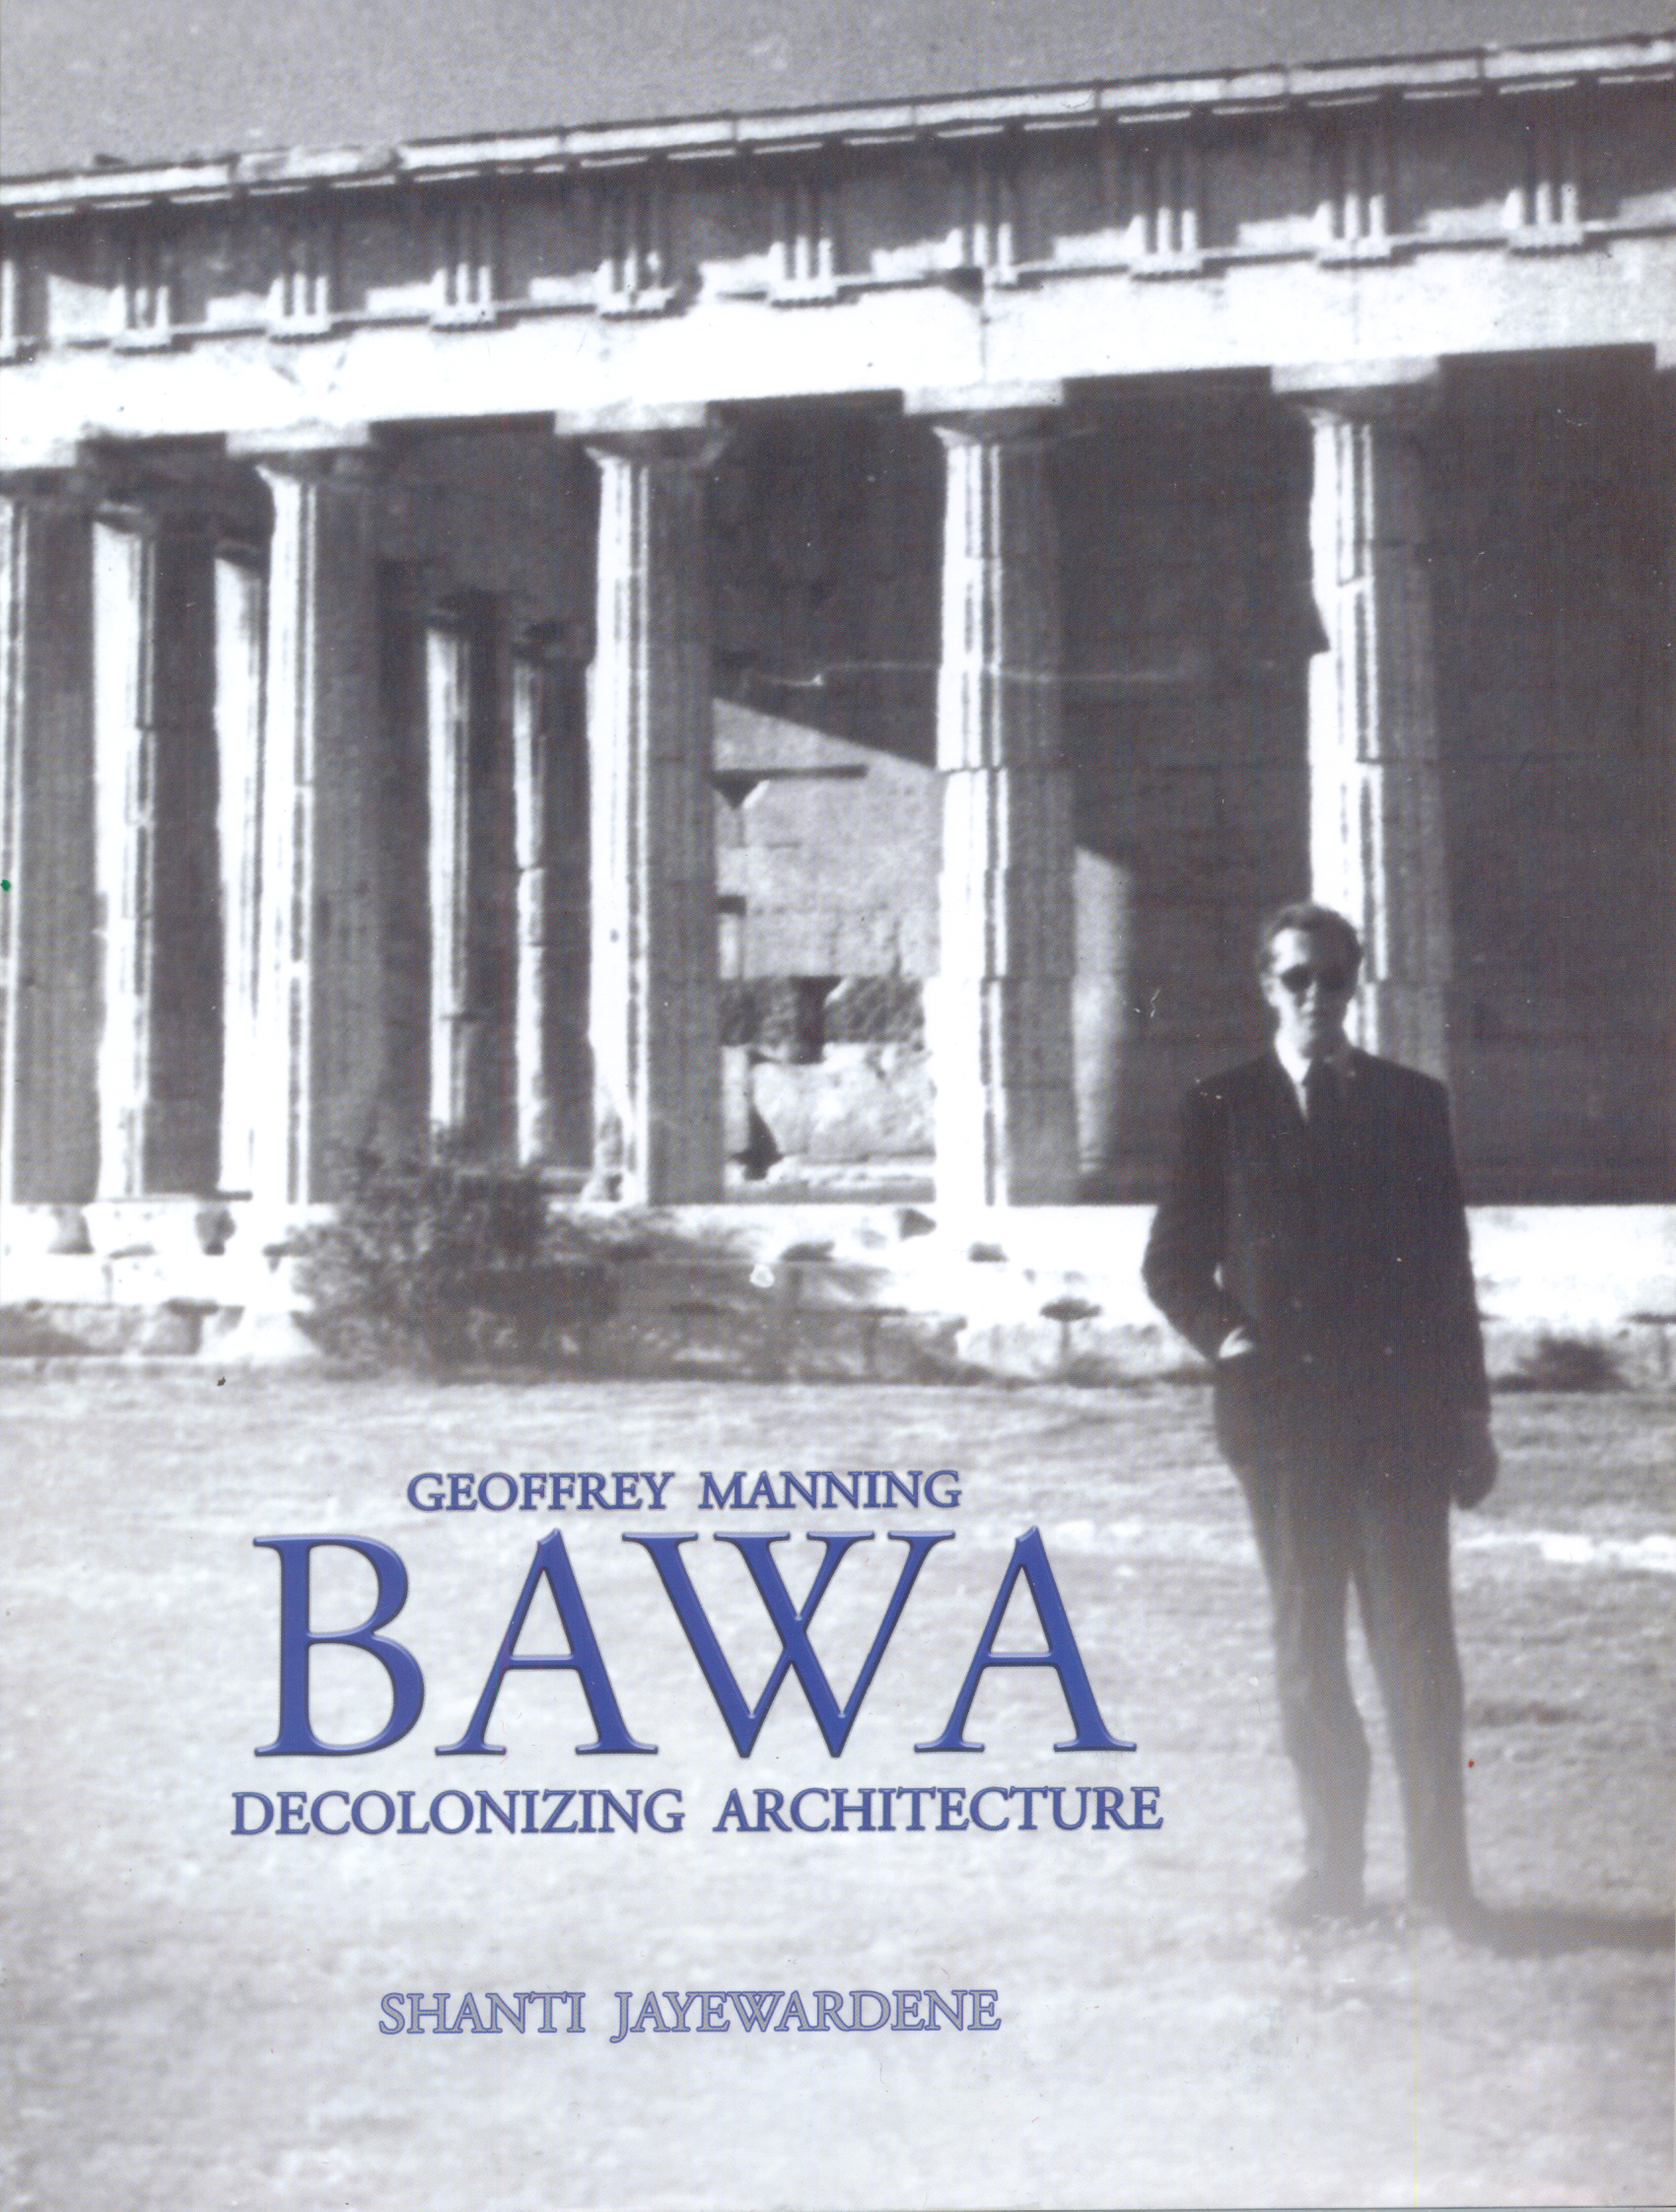 Geoffrey Manning Bawa - Decolonizing Architecture